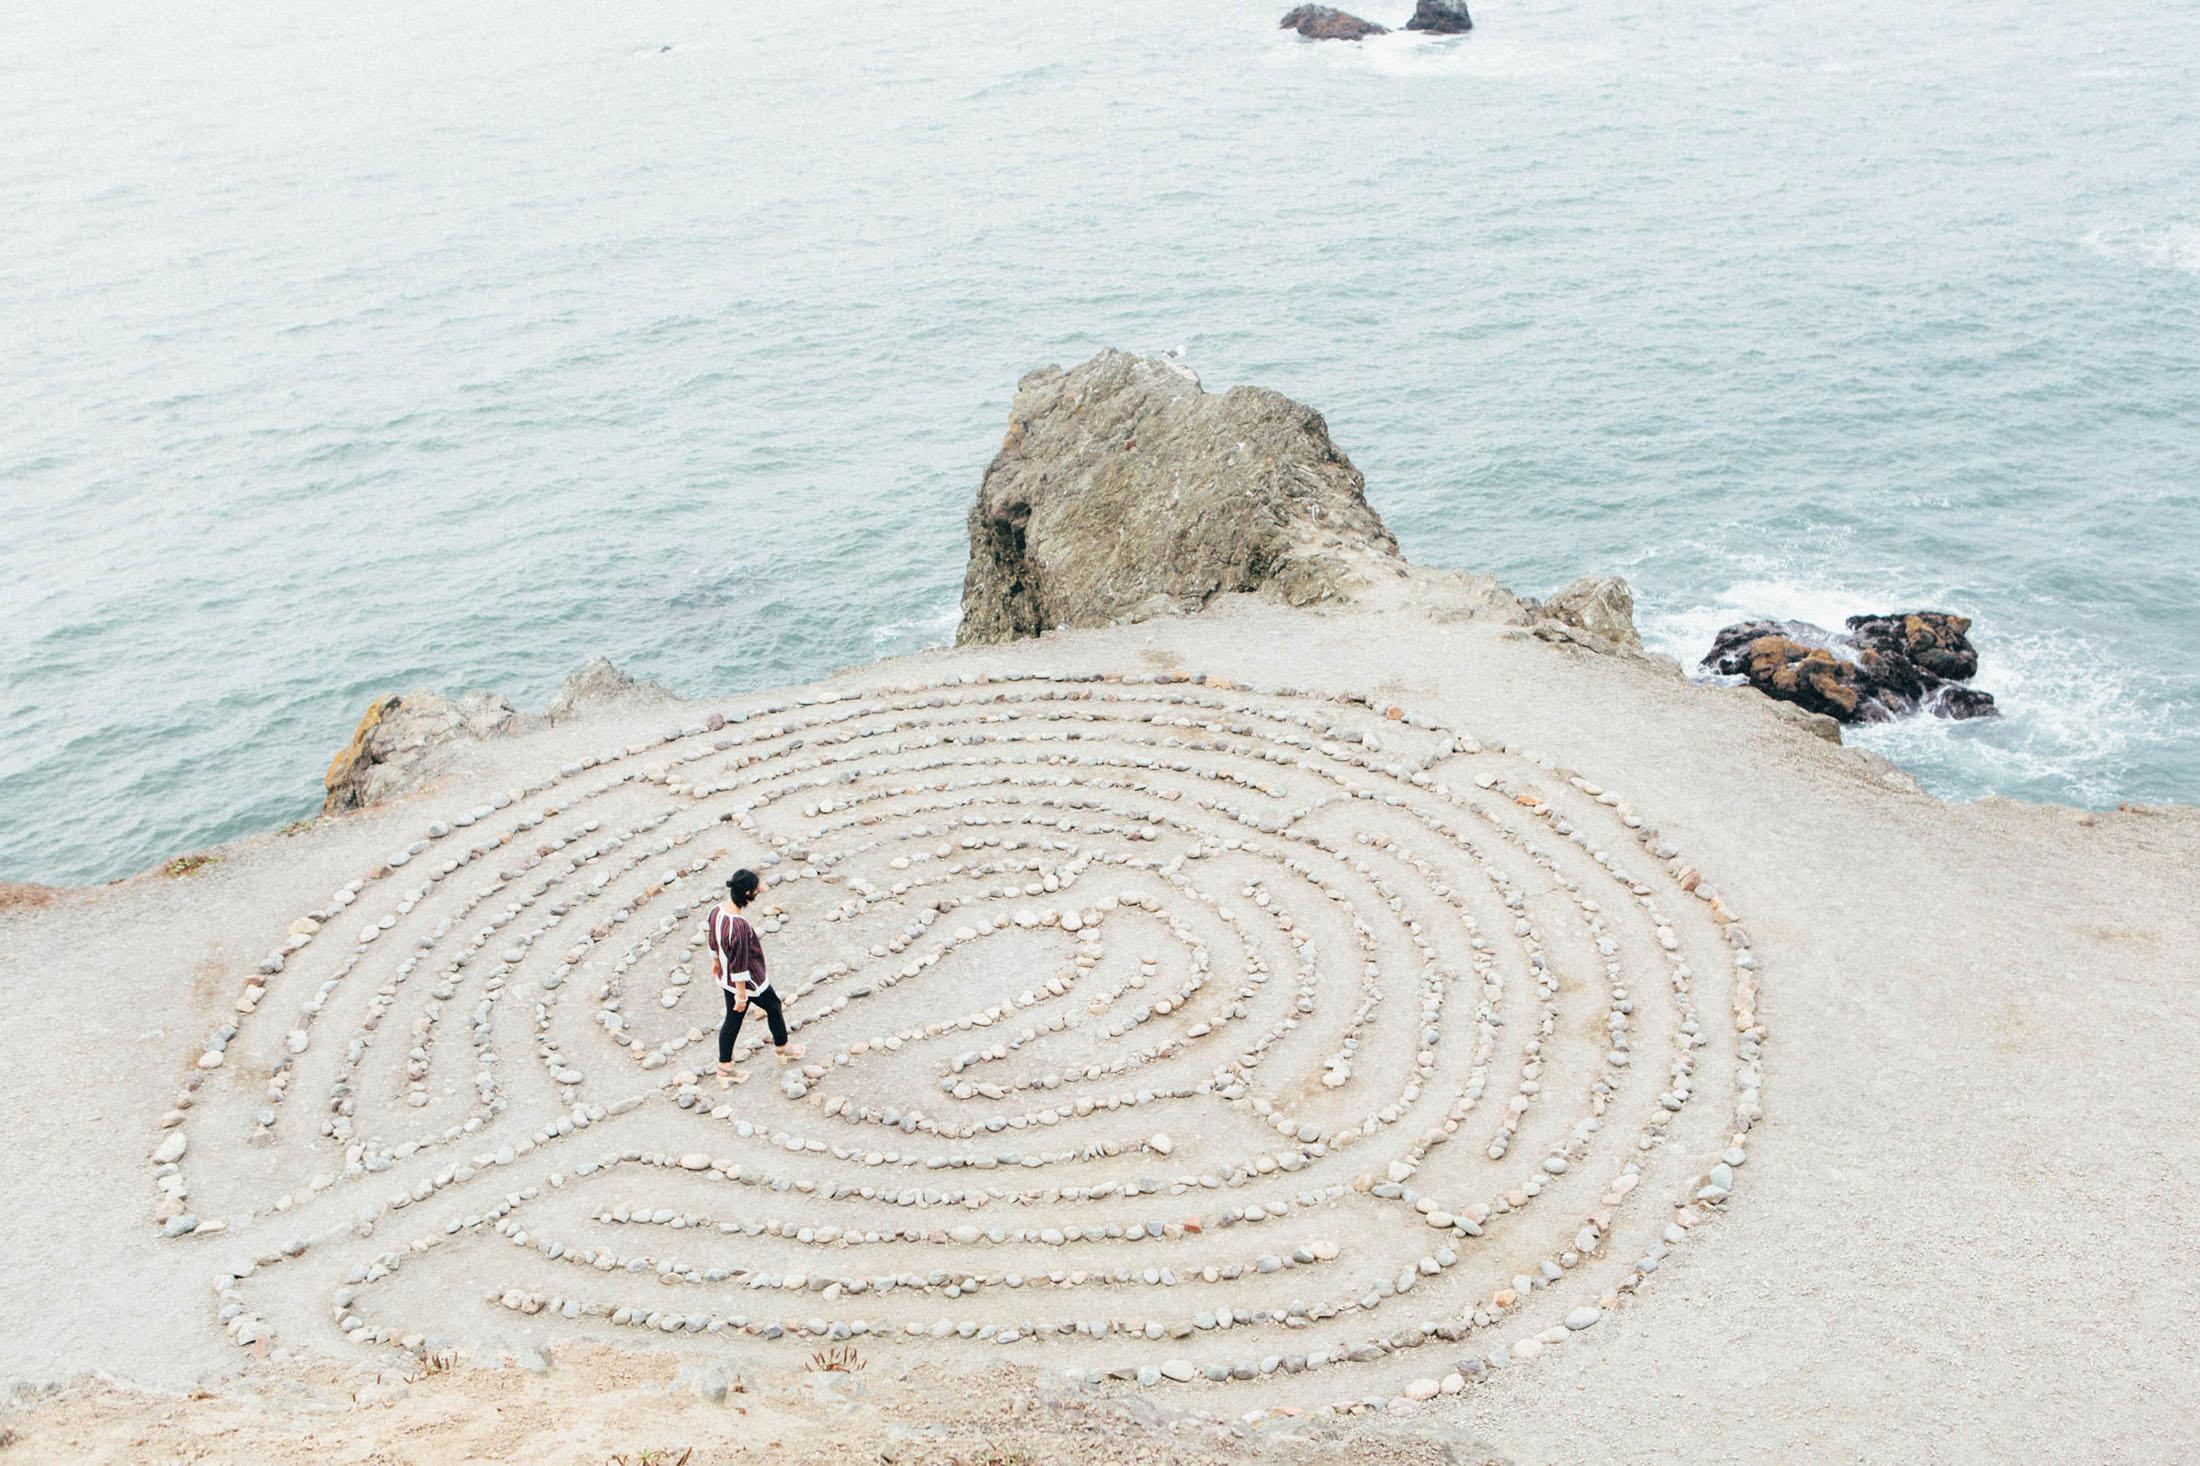 Woman near the ocean walking through a maze made of large rocks